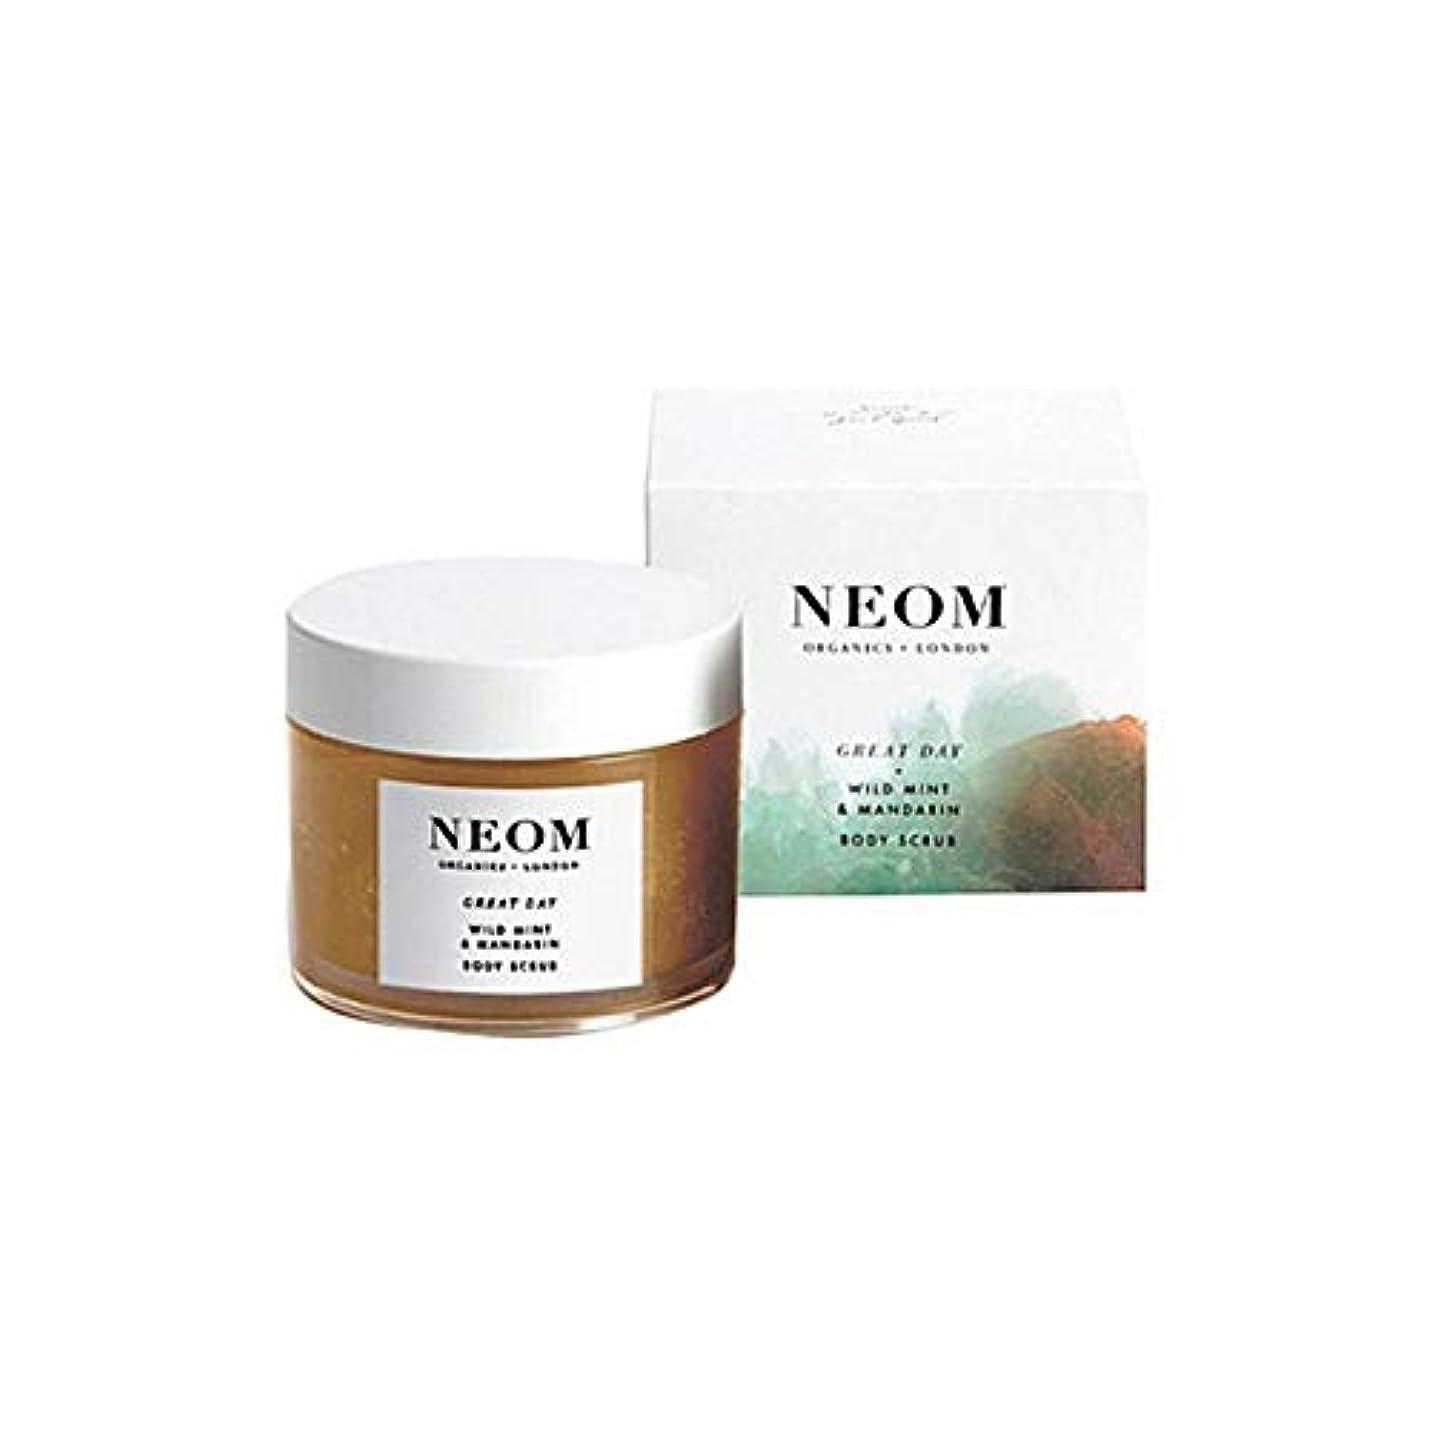 [Neom] Neom高級有機物素晴らしい一日ボディスクラブ332グラム - Neom Luxury Organics Great Day Body Scrub 332G [並行輸入品]